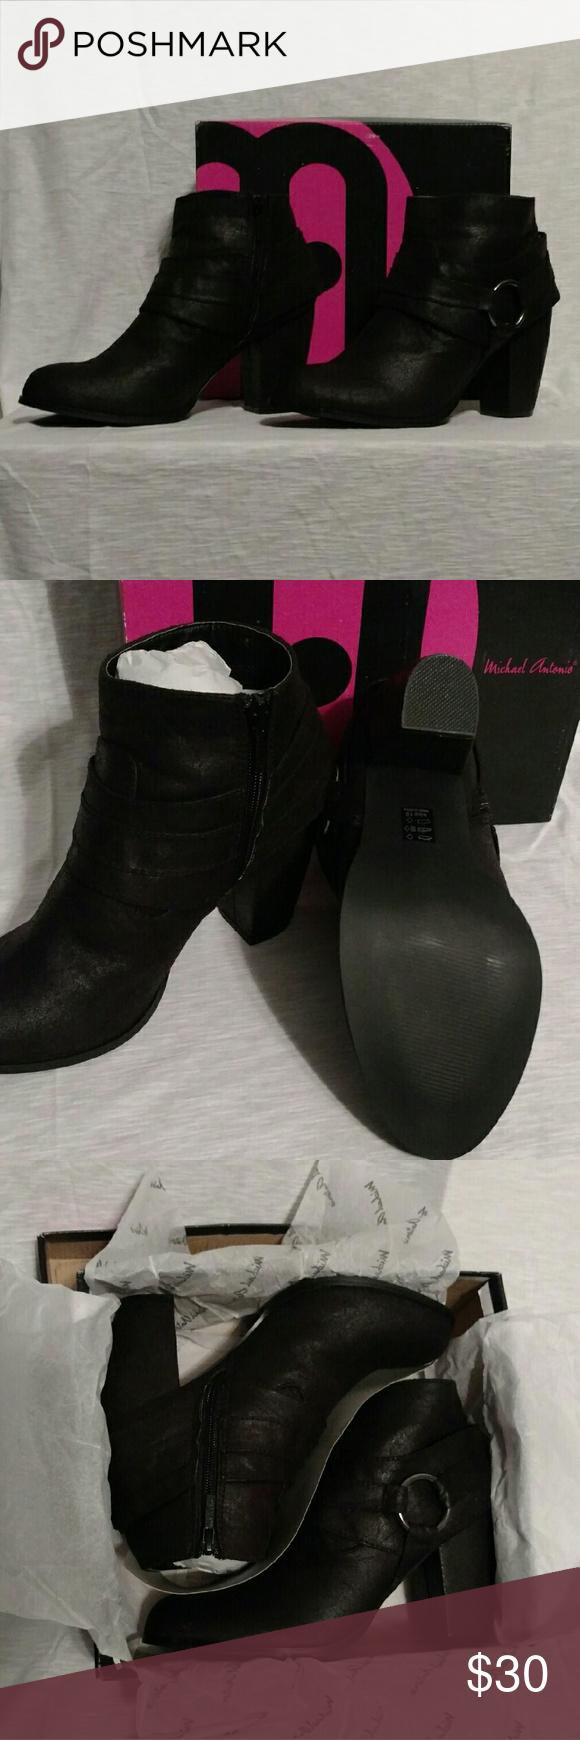 Michael Antonio Martina Booties - sz10 Michael Antonio Martina Booties New with original box Never worn Black size 10 Michael Antonio Shoes Ankle Boots & Booties